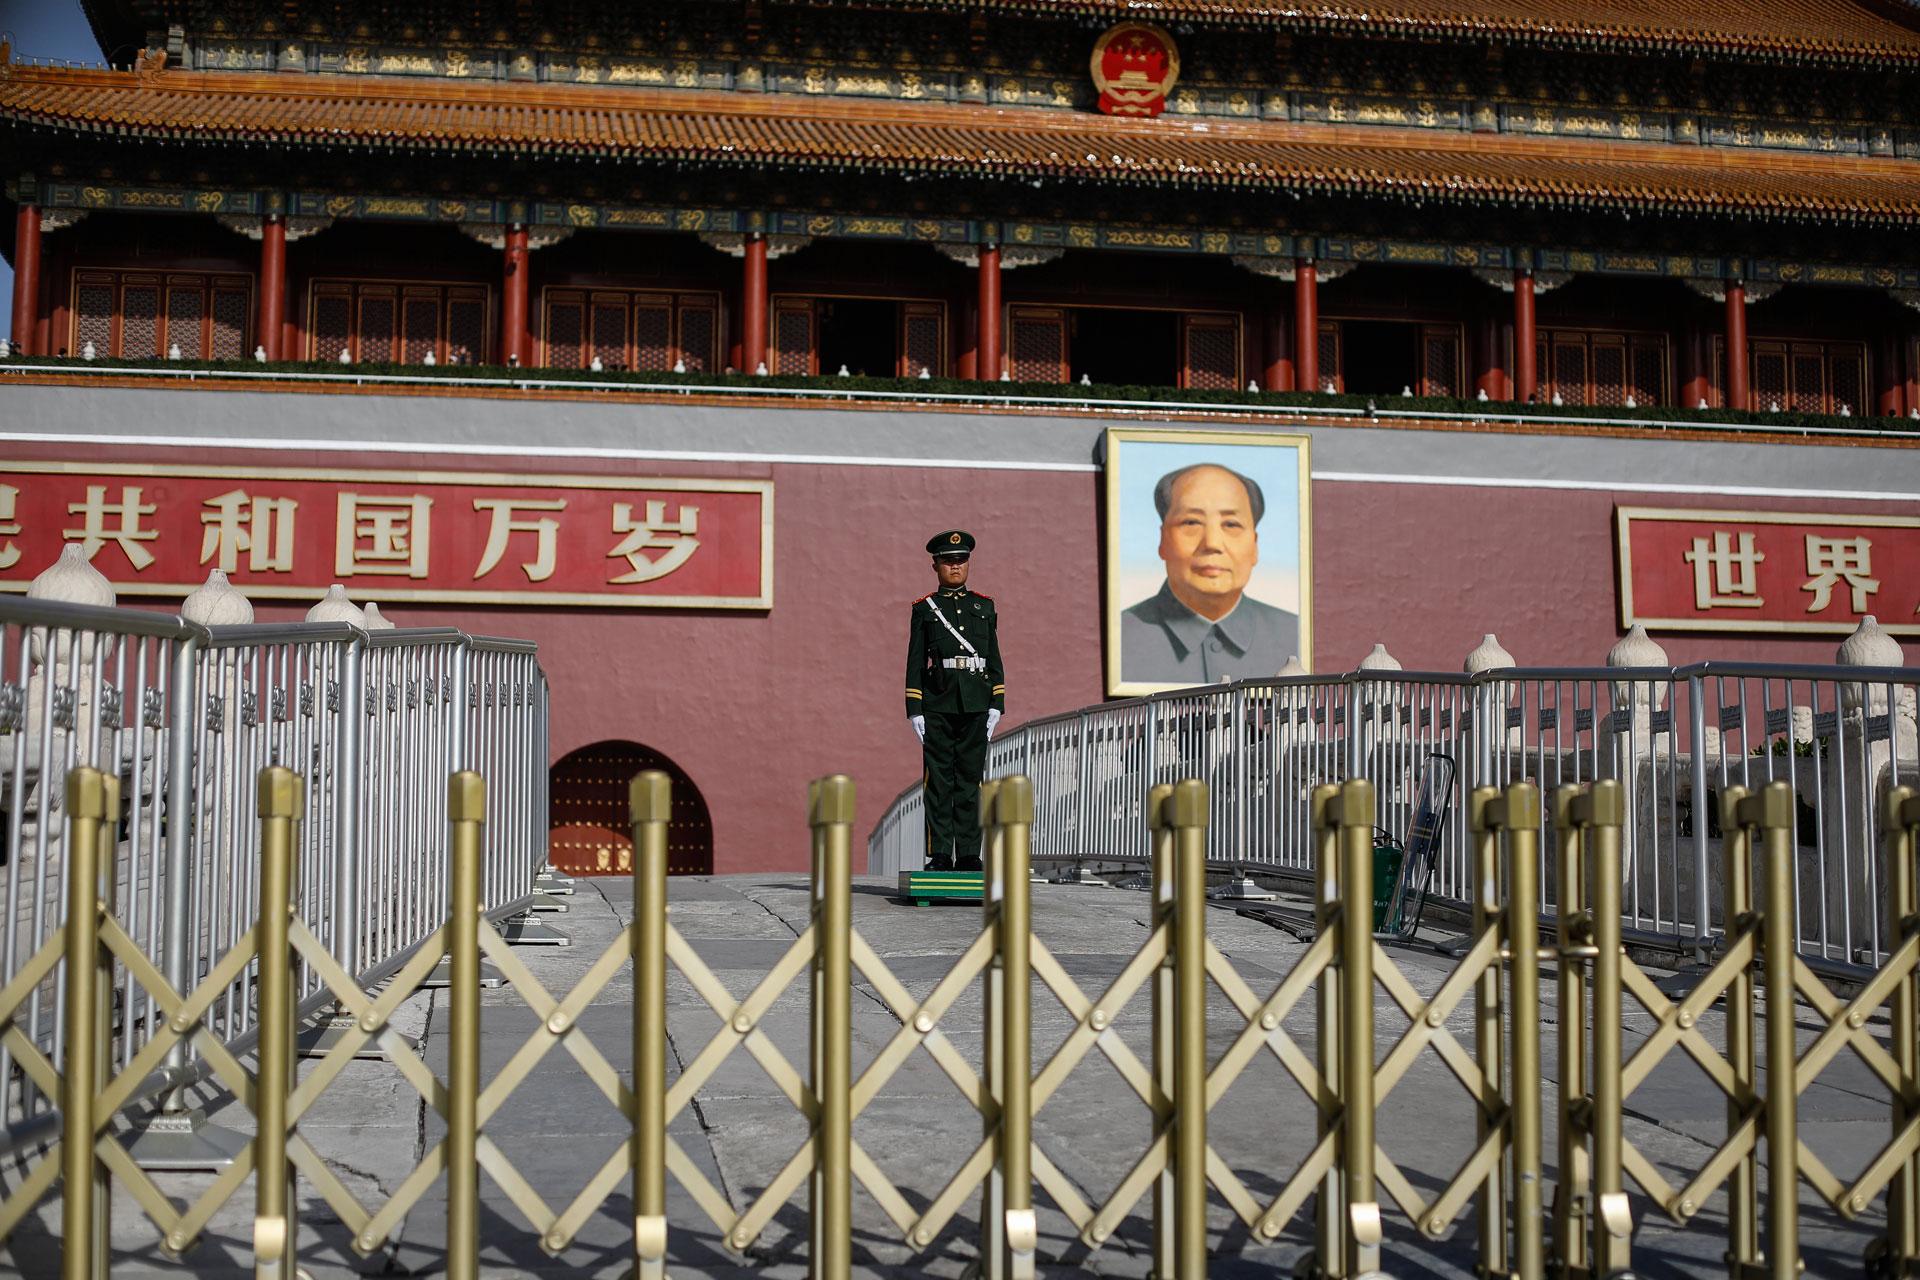 china  eu bezorgd over arrestatie zweedse uitgever    villamedia